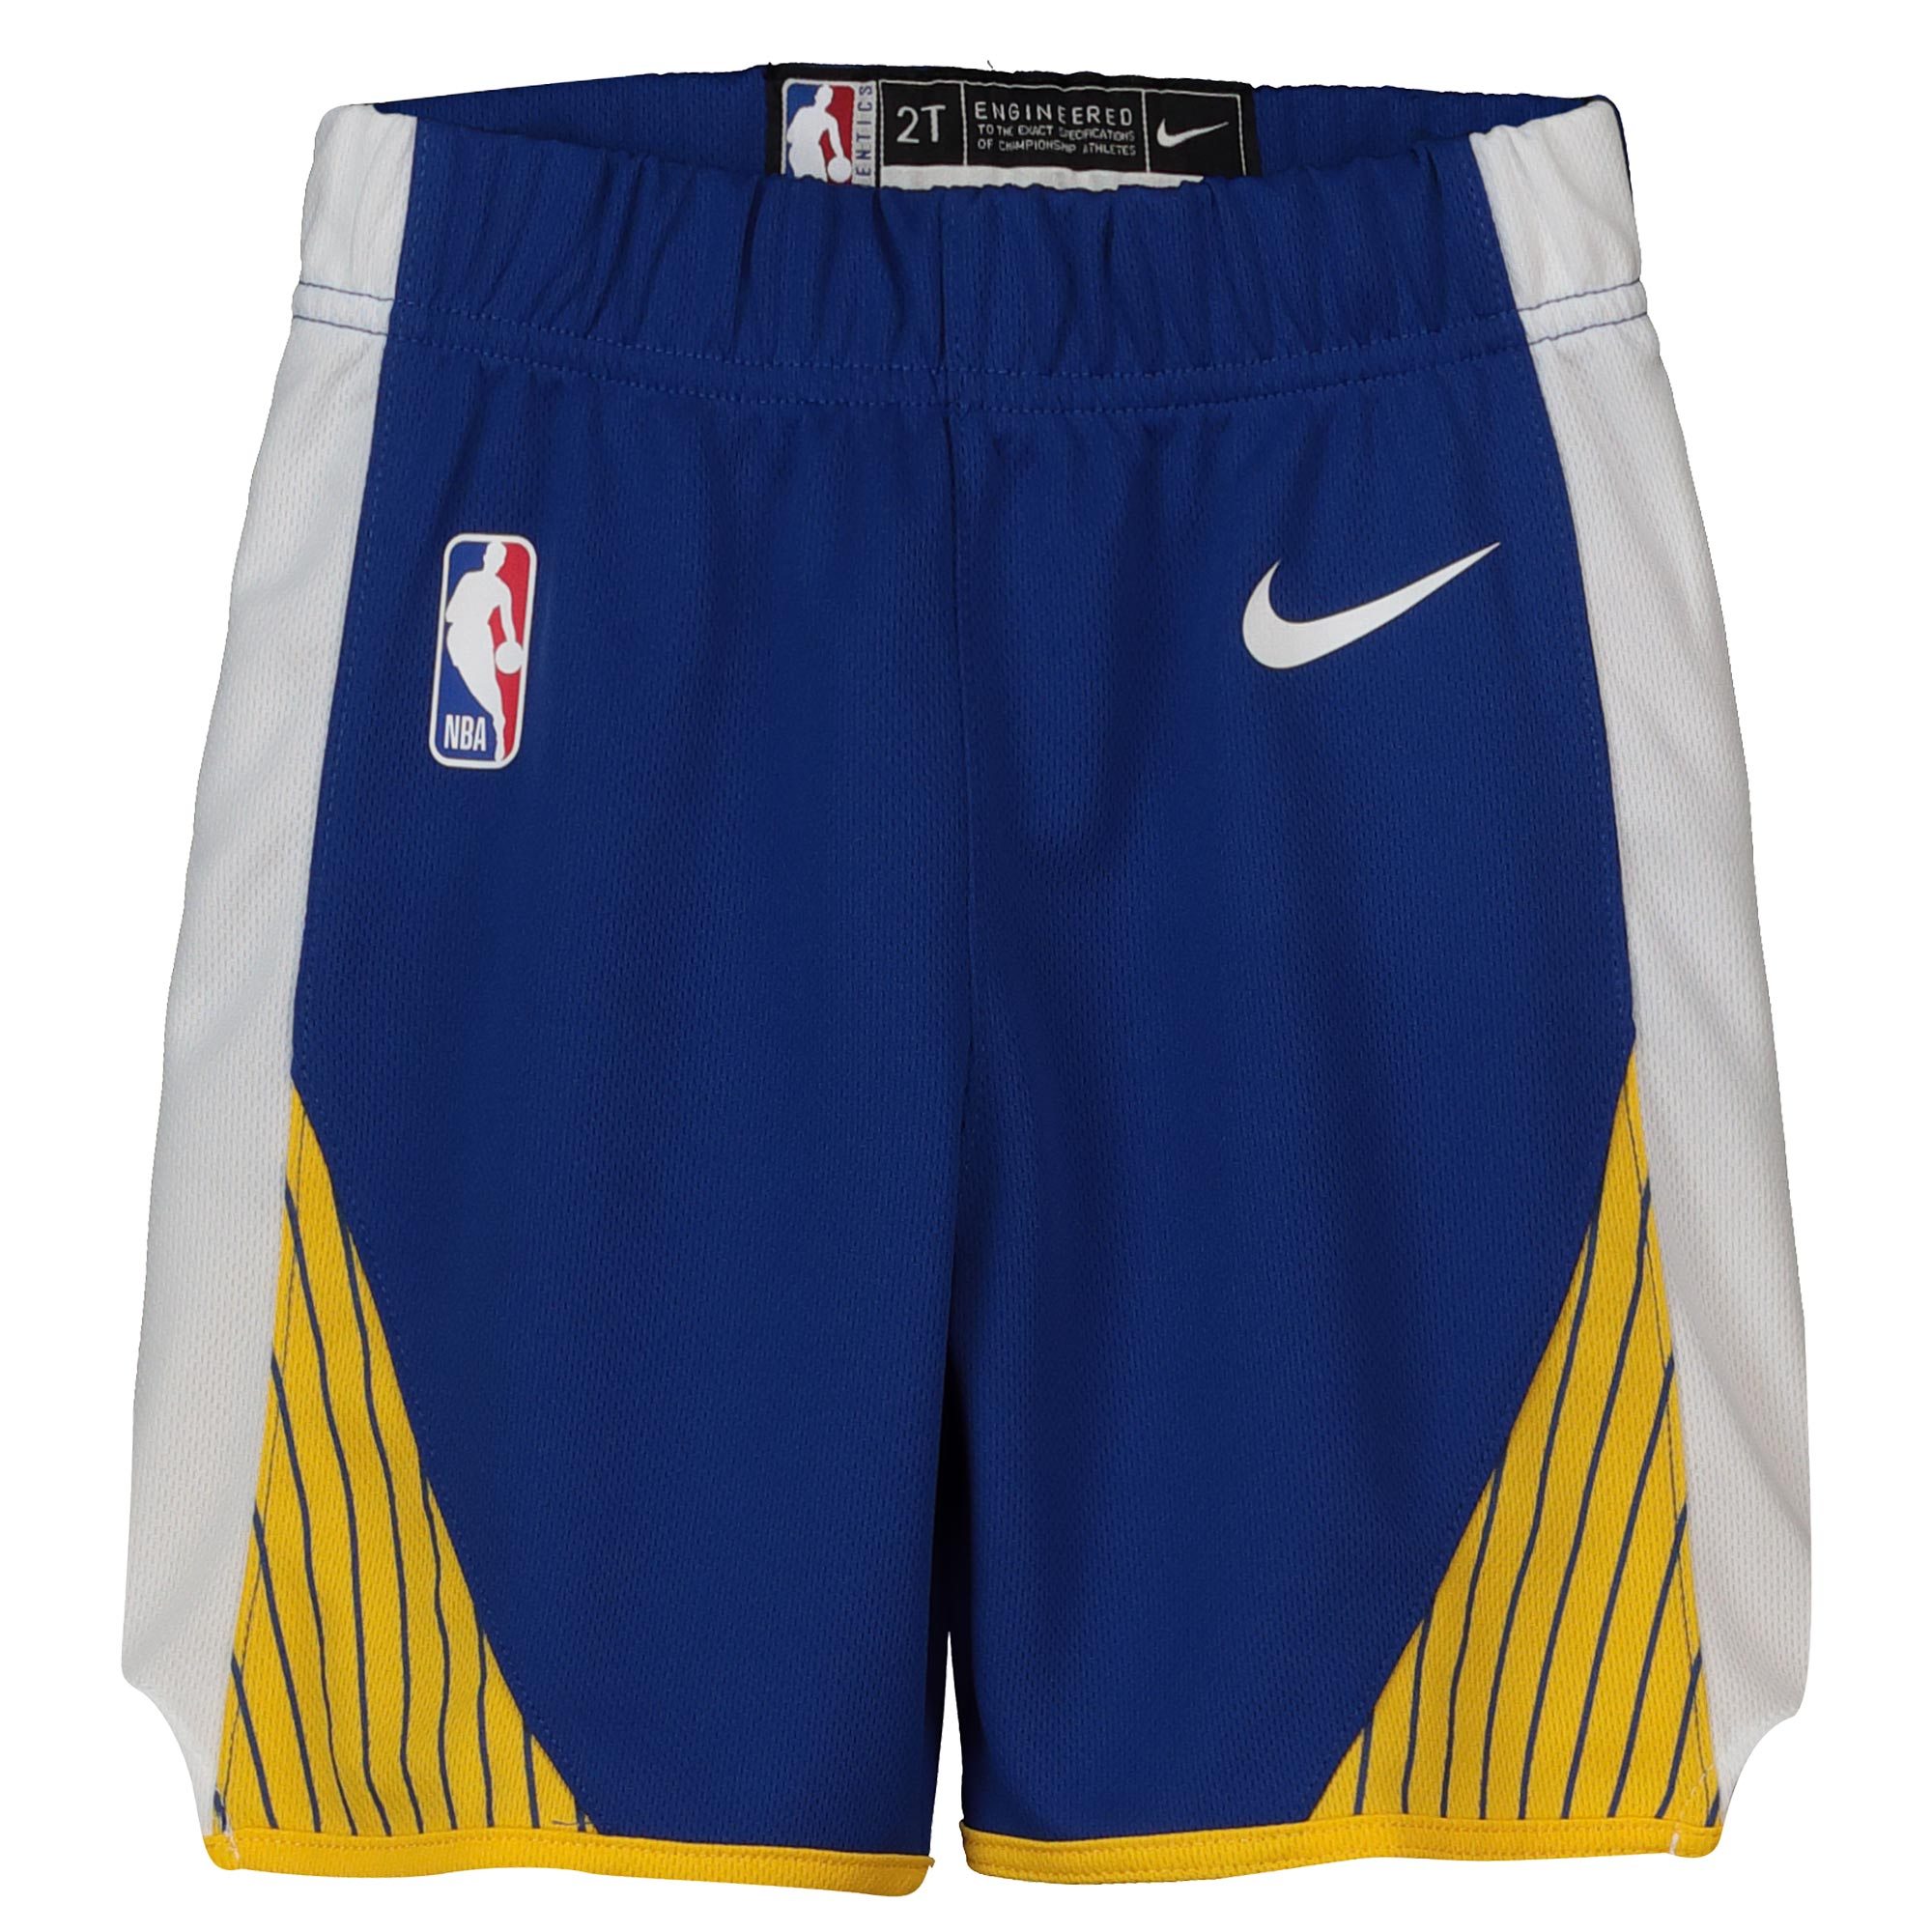 Golden State Warriors Nike Icon Replica Short - Toddler